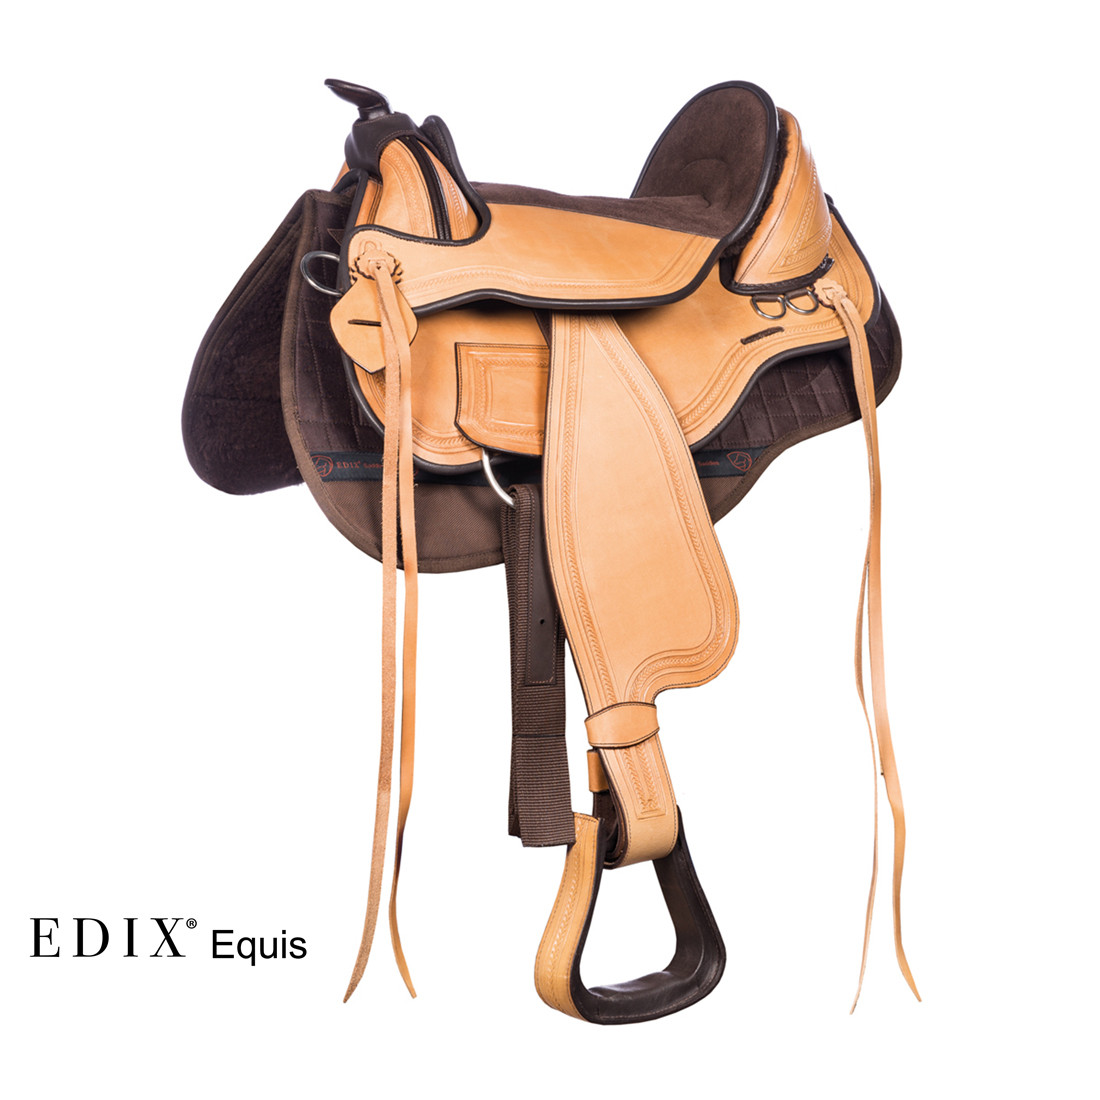 EDIX® Equis (complete set bruin/naturel)